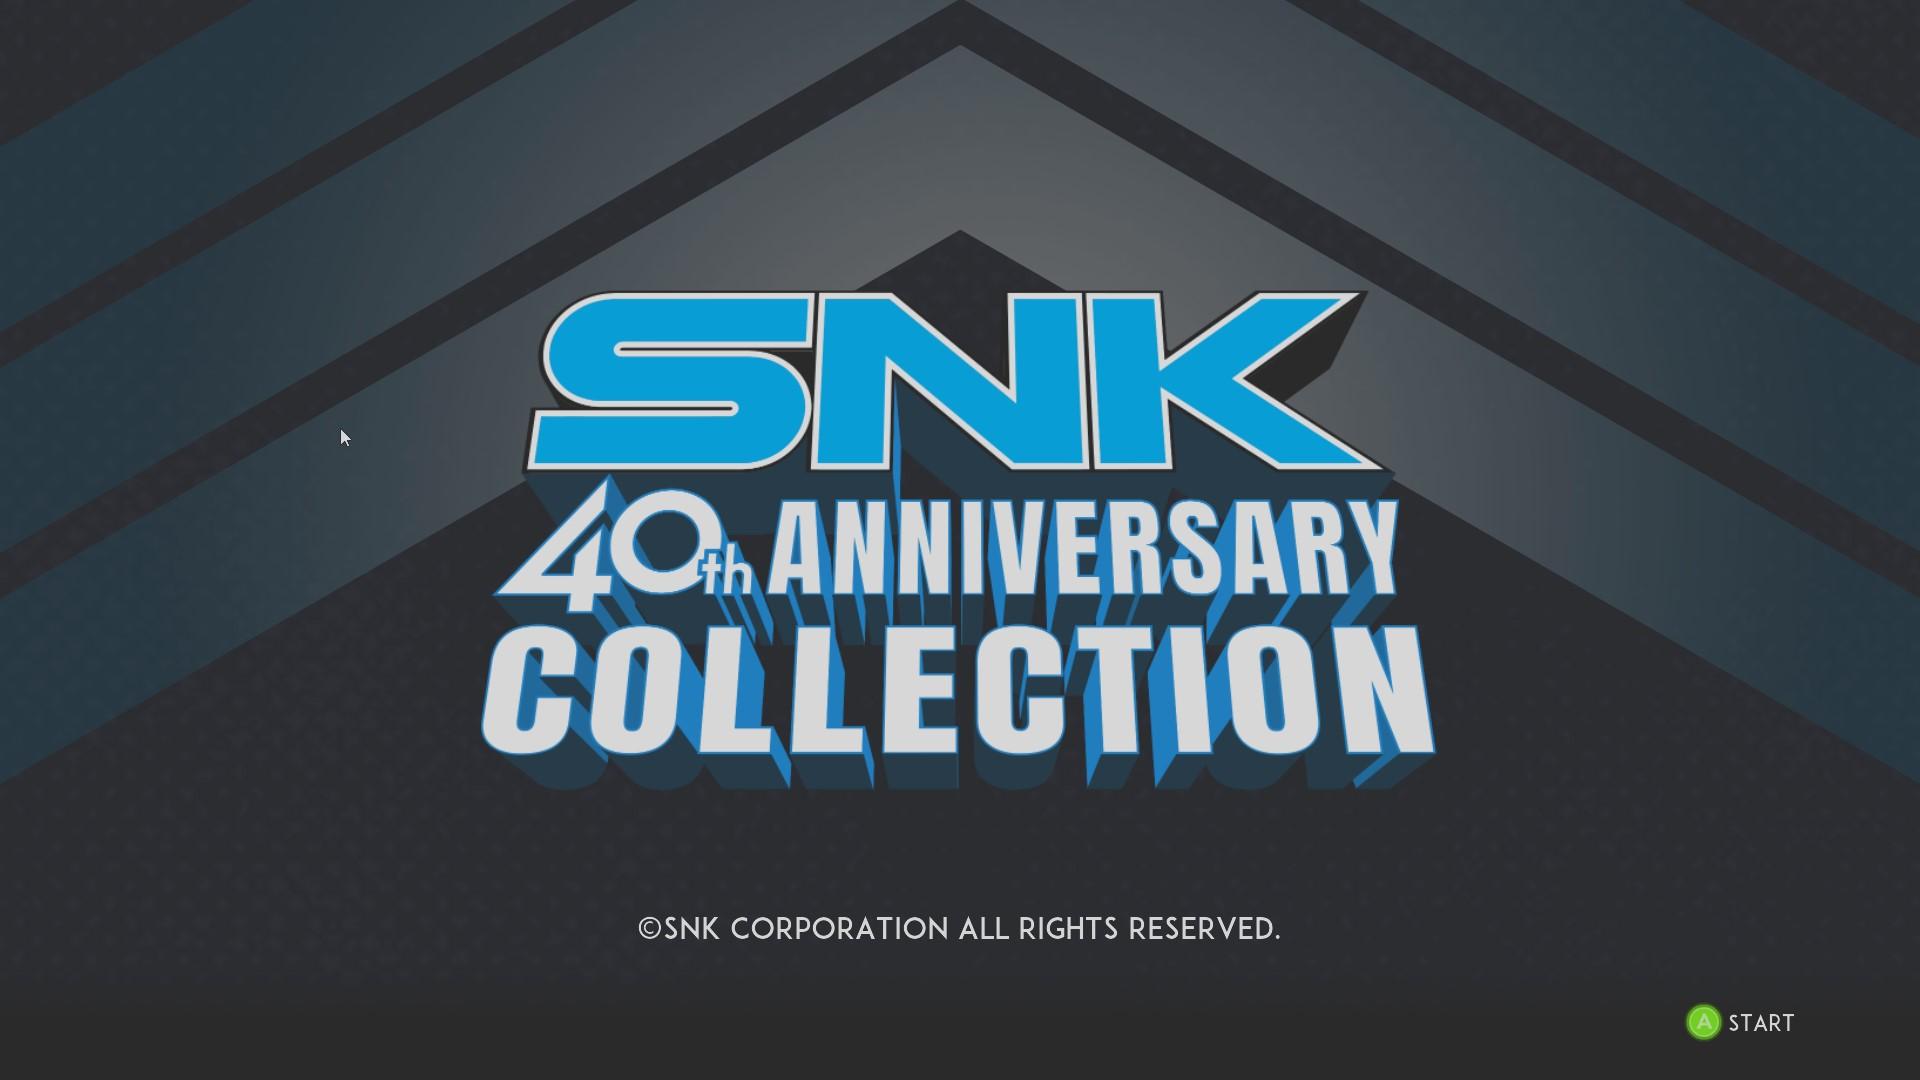 AkinNahtanoj: SNK 40th Anniversary Collection: Sasuke vs. Commander (PC) 240 points on 2020-08-24 13:22:45